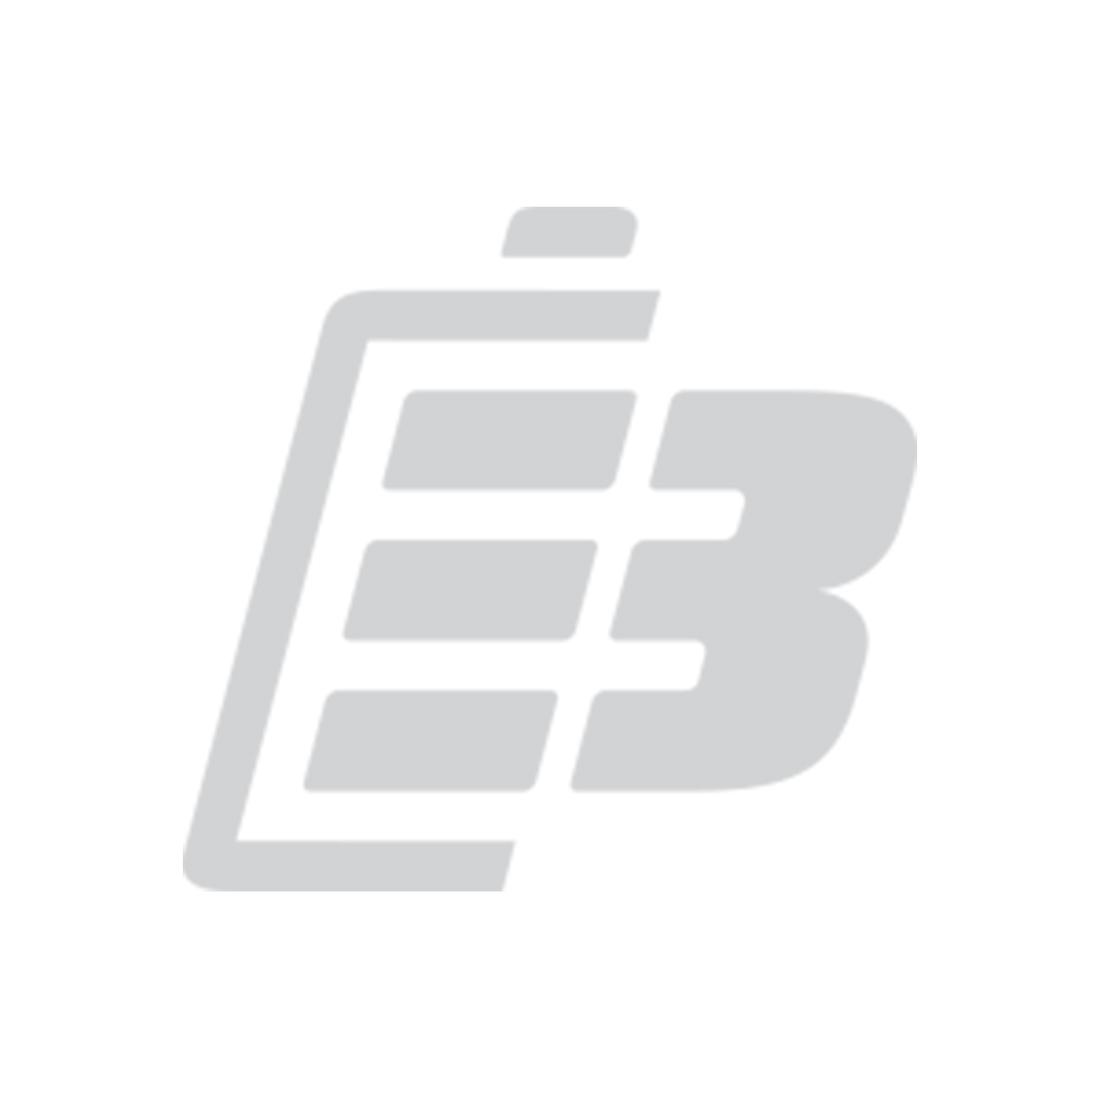 Cordless phone battery Siemens Gigaset SL37H_1